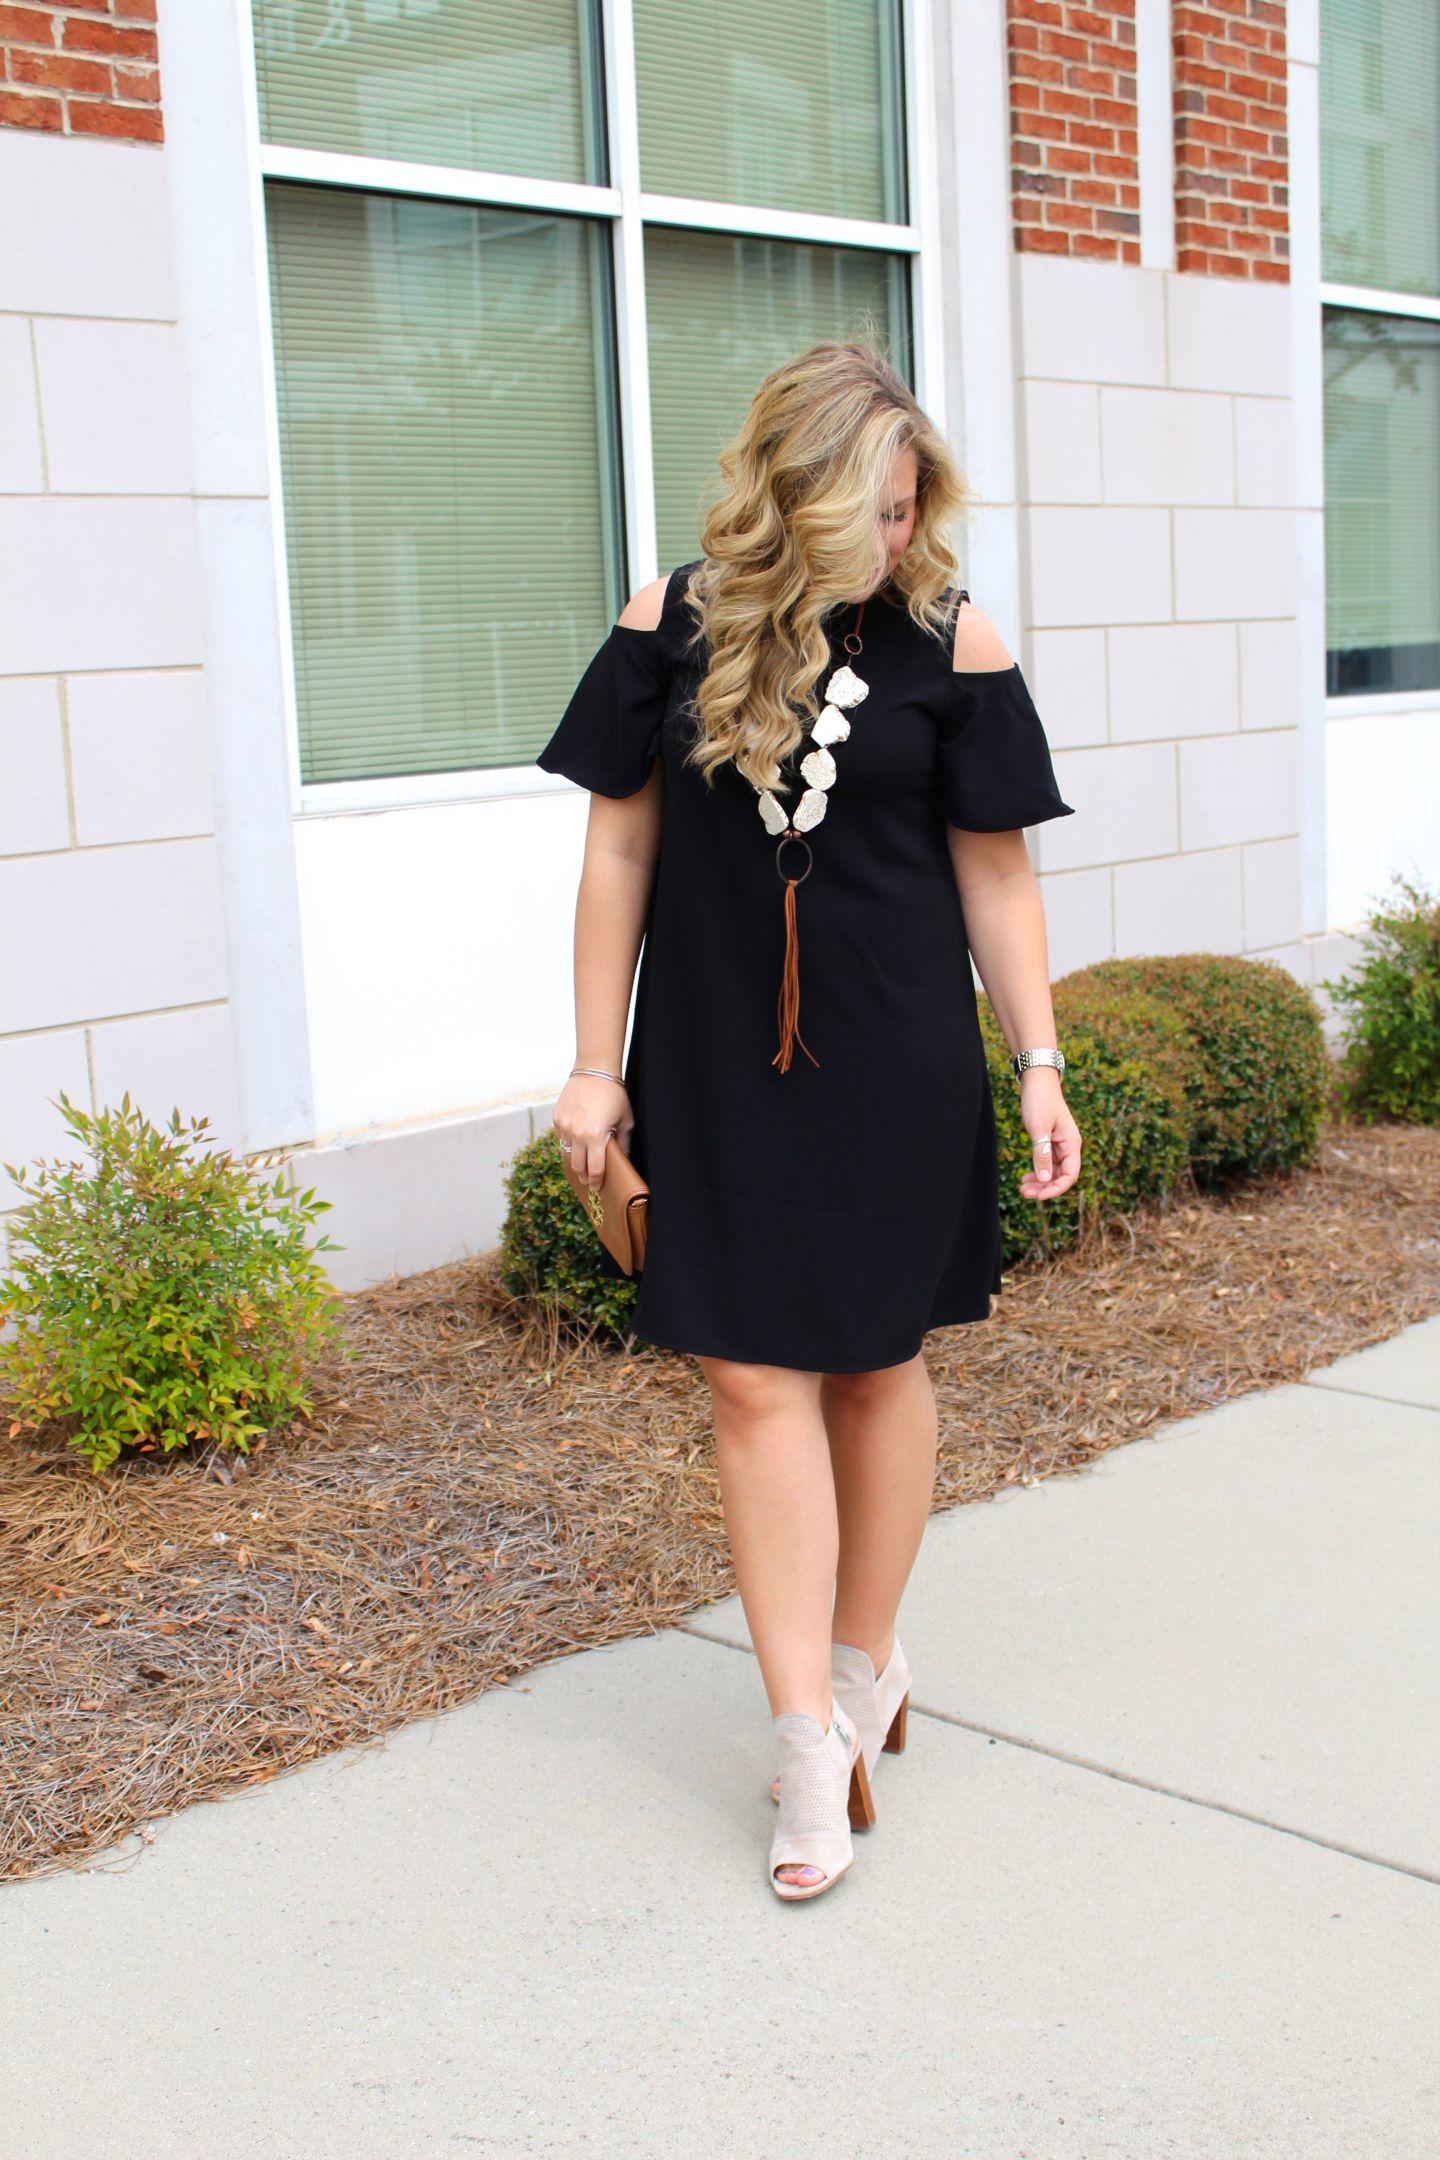 Black Cold Shoulder Dress Tan Ankle Boots Stone Necklace Black Cold Shoulder Dress Plus Size Fashion Fashion [ 2160 x 1440 Pixel ]